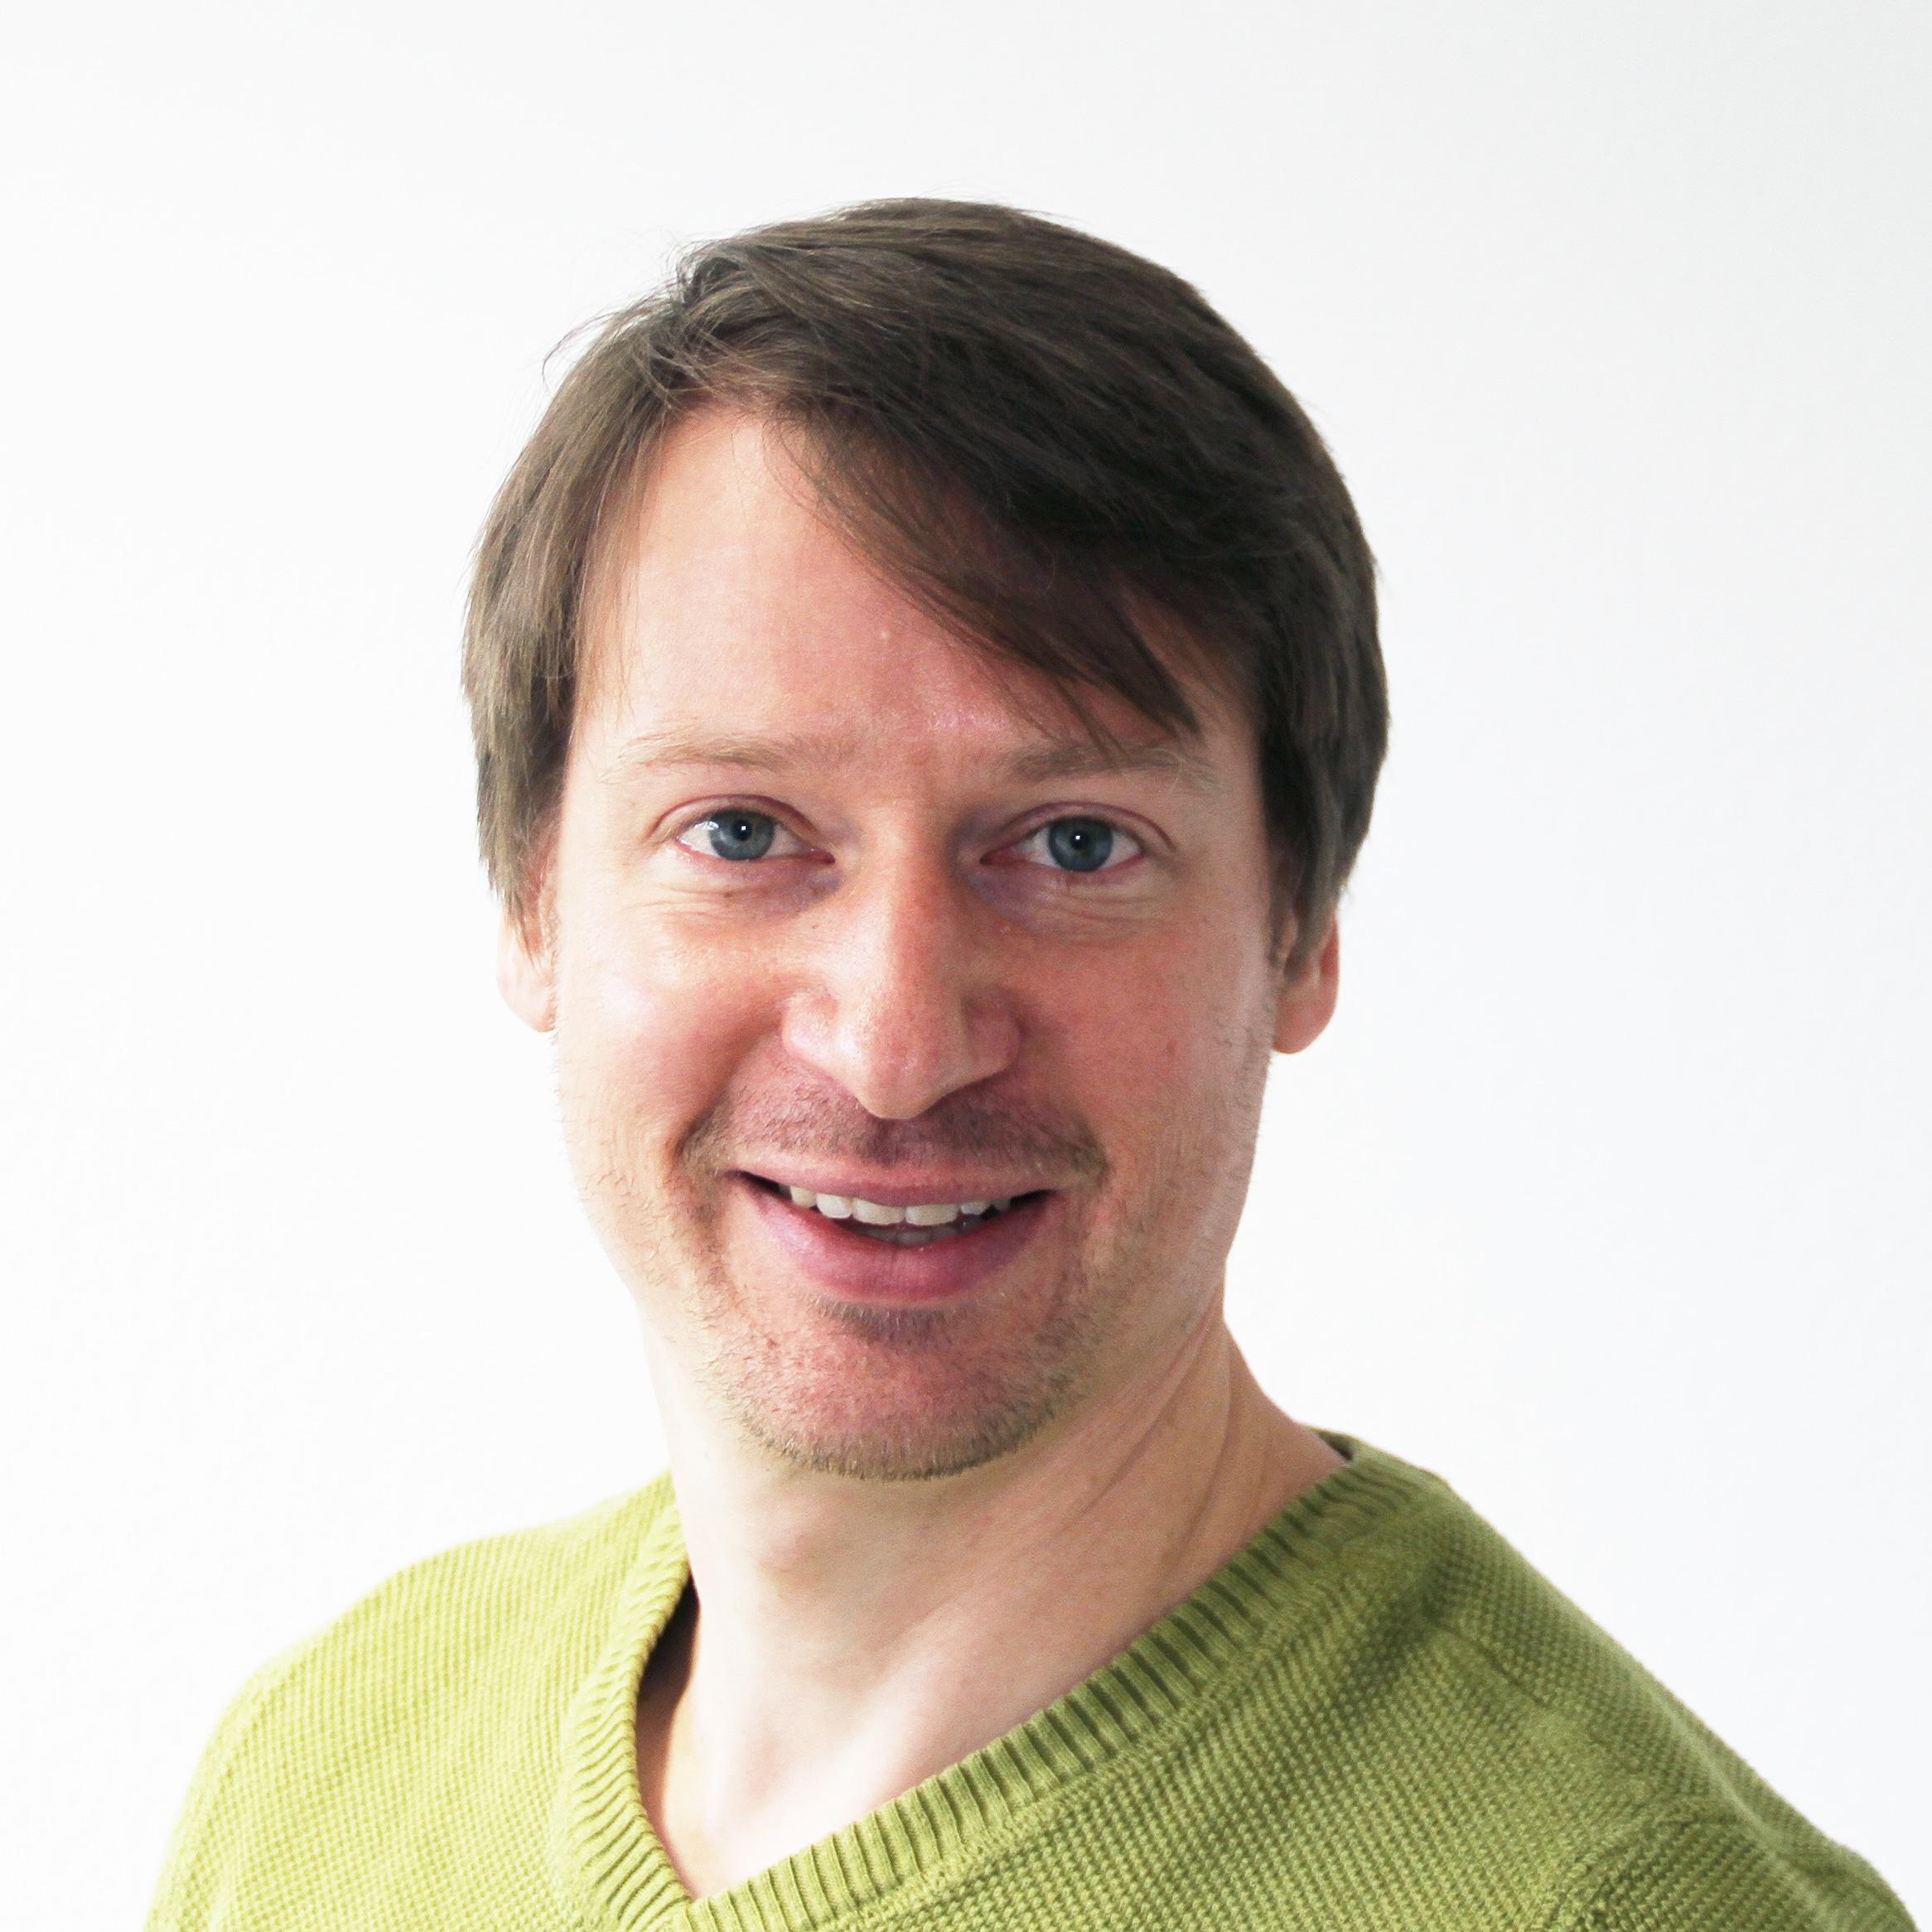 Martin Hüttl, Ehrenamtskoordinator